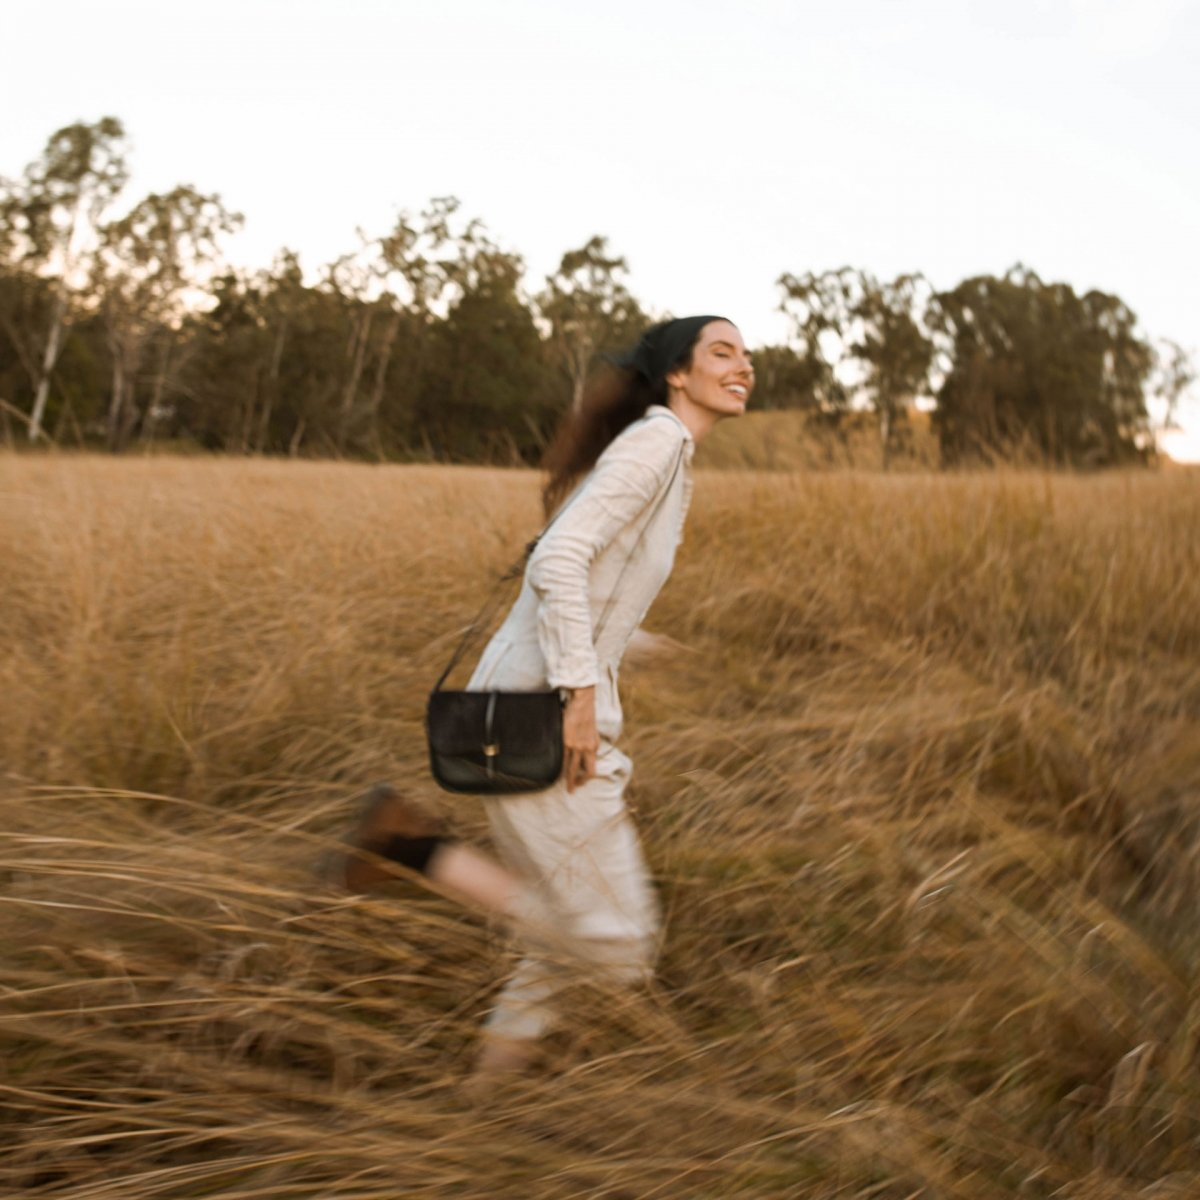 Pastis handbag - Cuba Libre (image n°5)